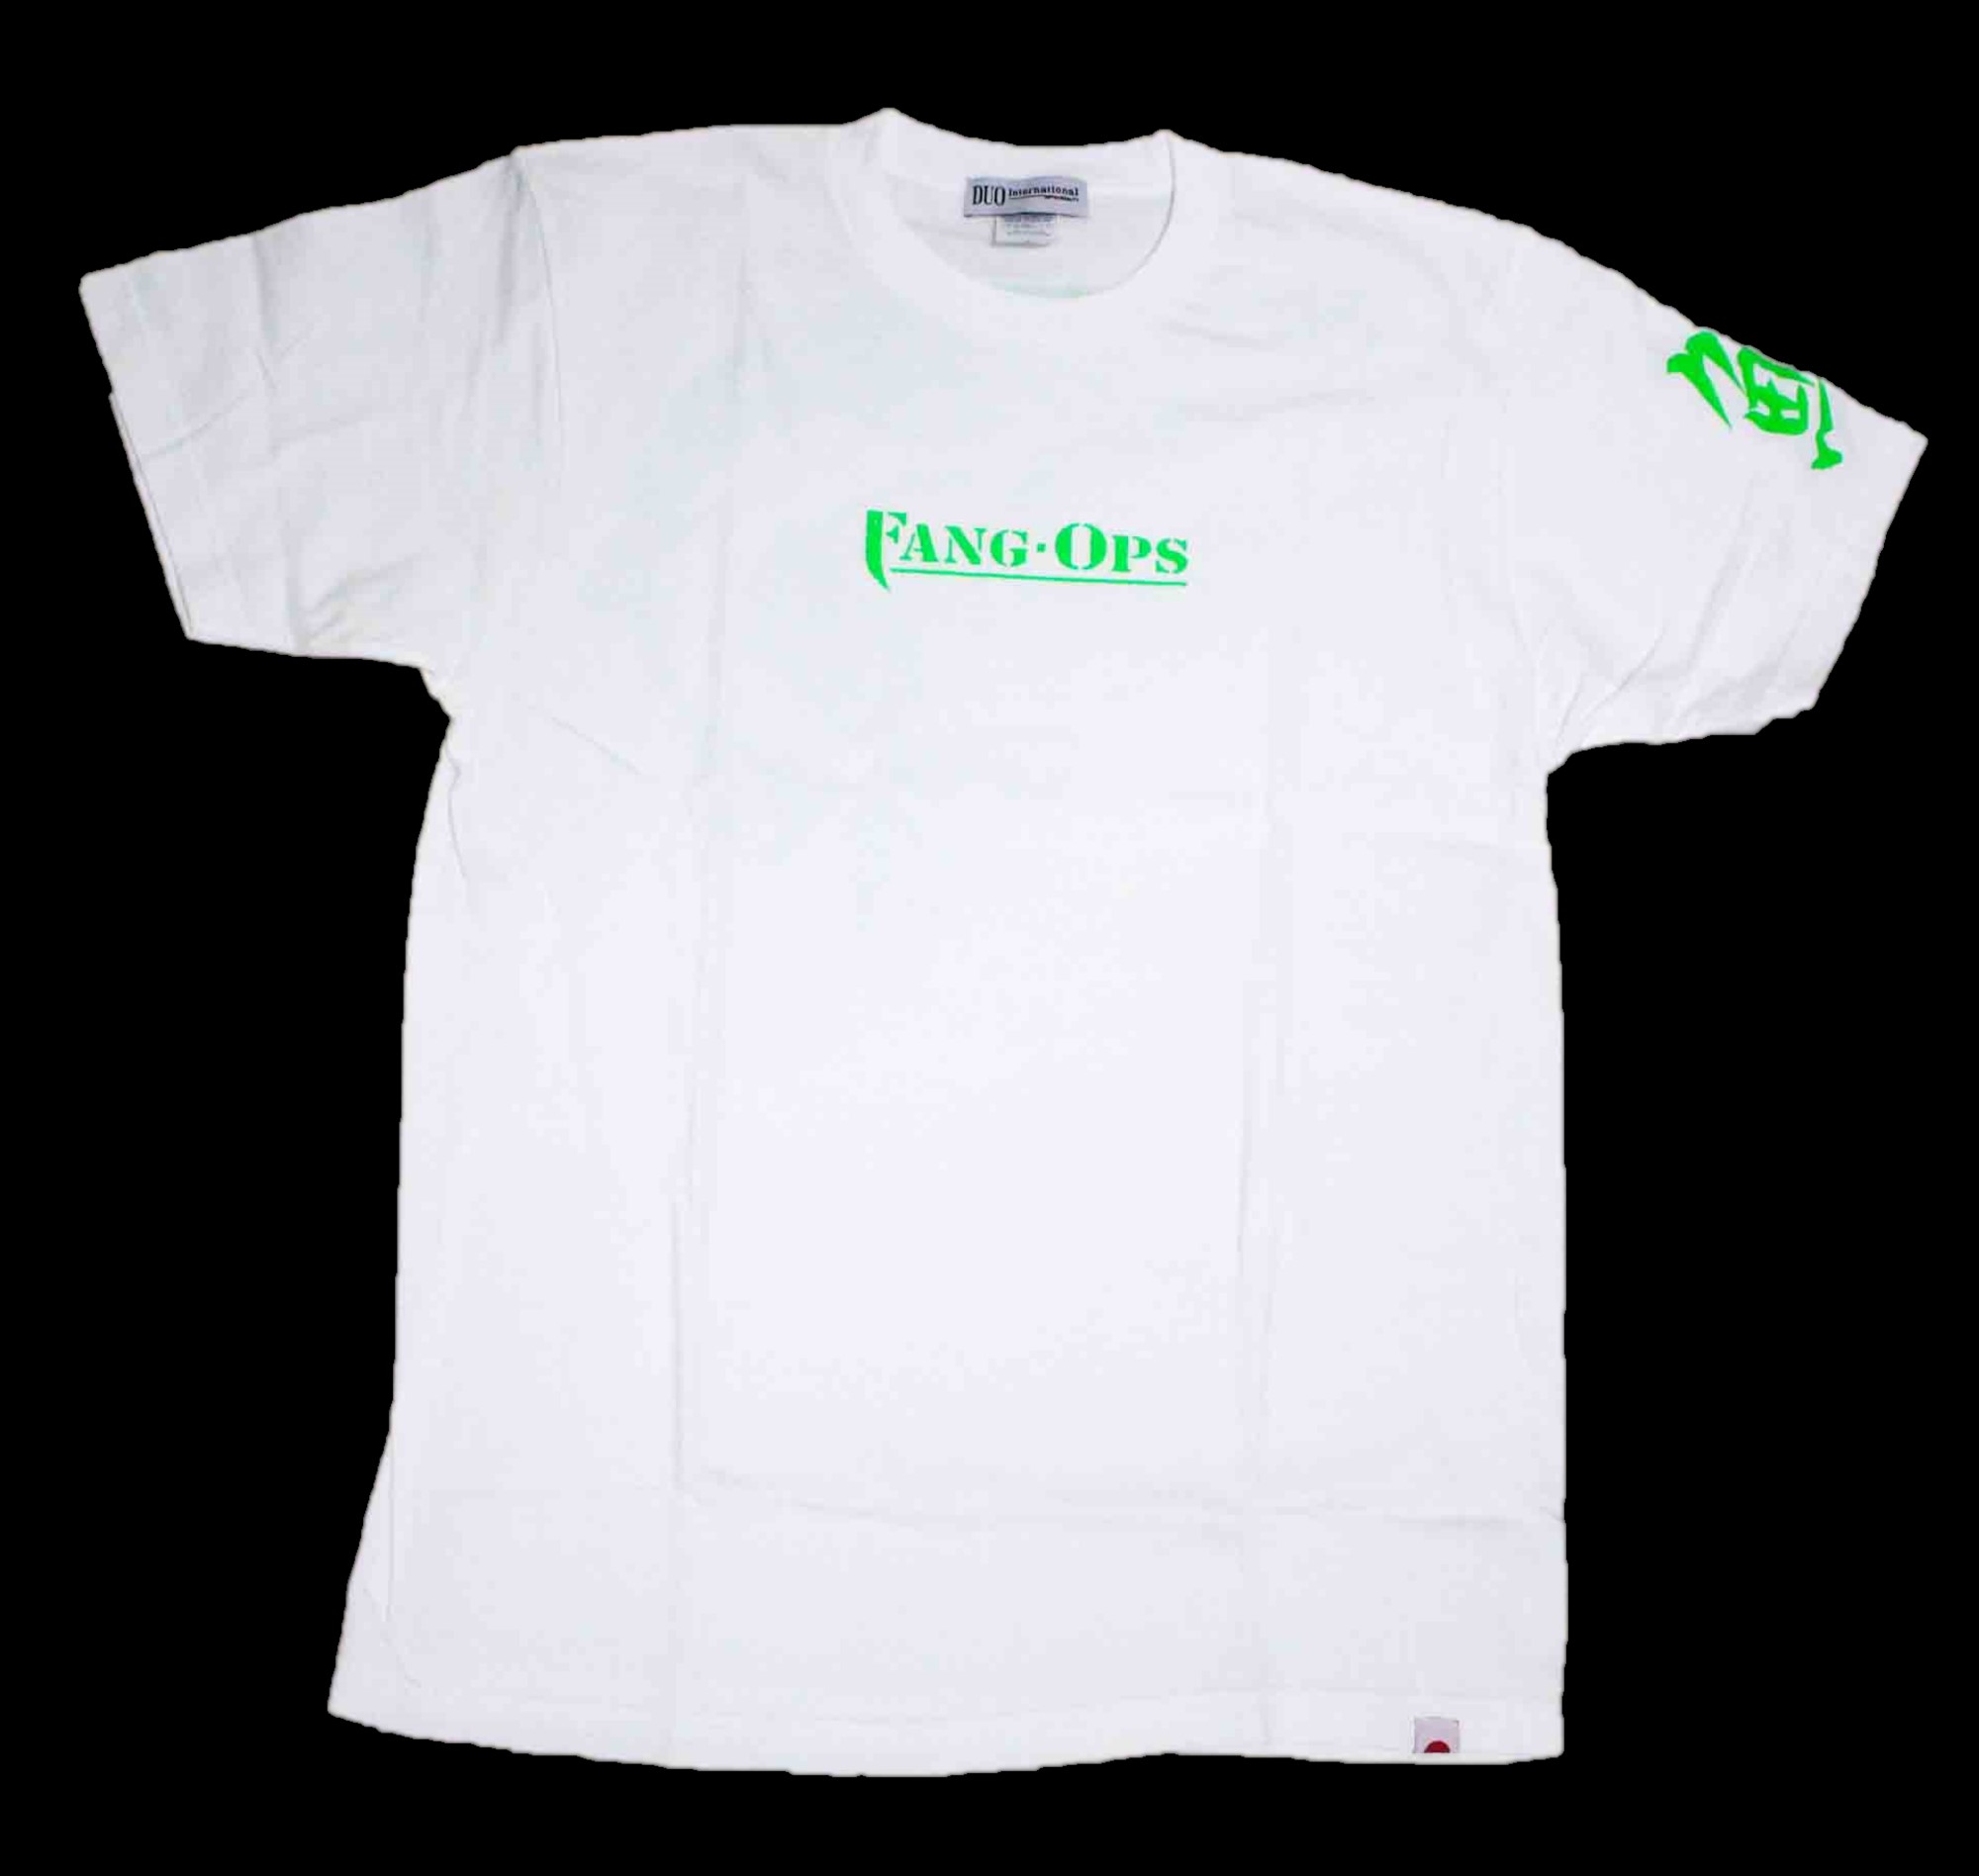 Duo T Shirt Fang Ops Beast Pike Short Sleeve Cotton White Size XL (1546)